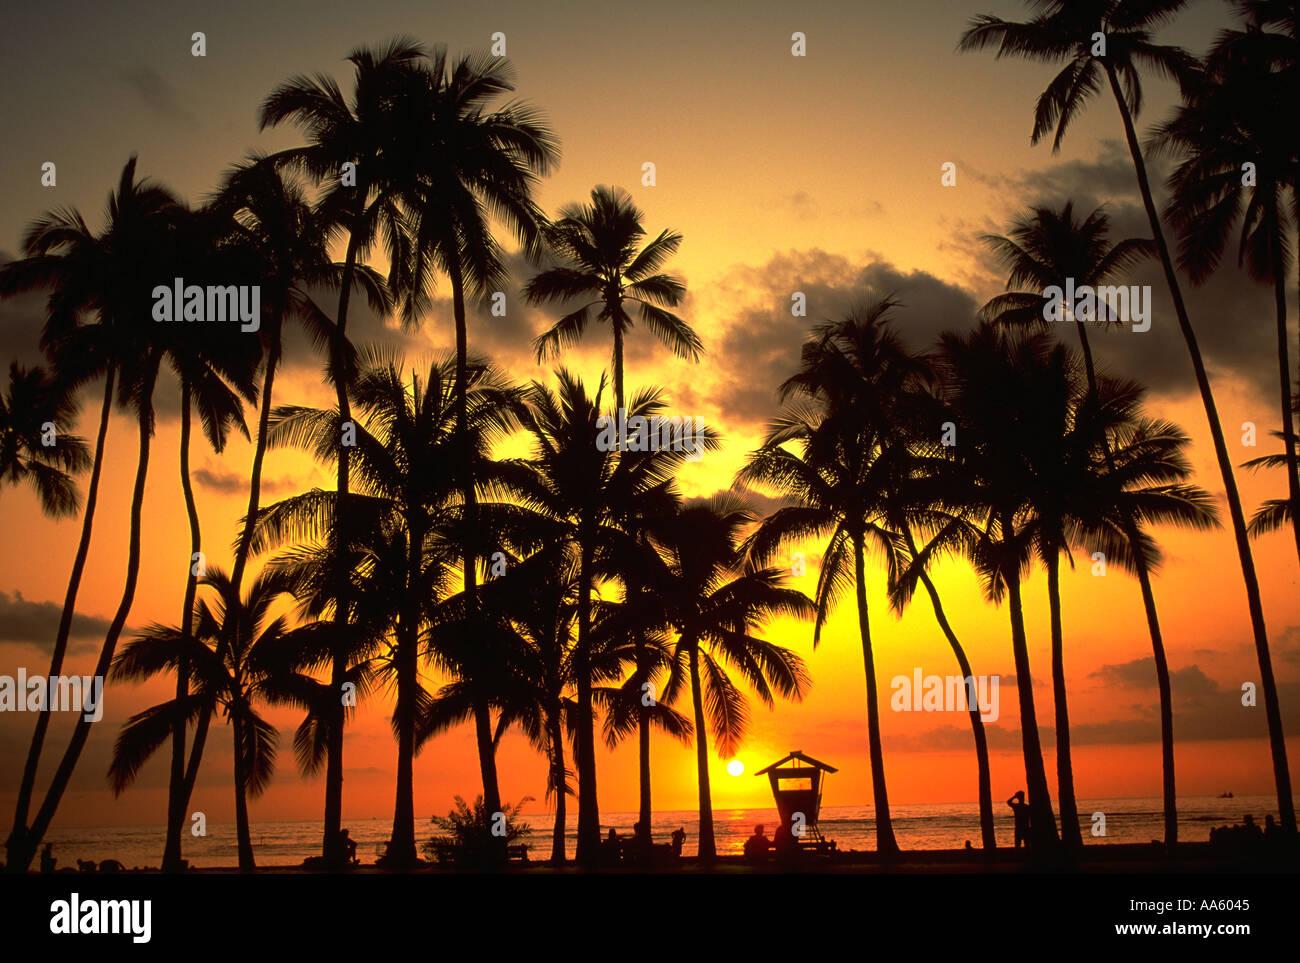 Tramonto sulla spiaggia di Waikiki di Oahu Waikiki Hawaii USA Immagini Stock